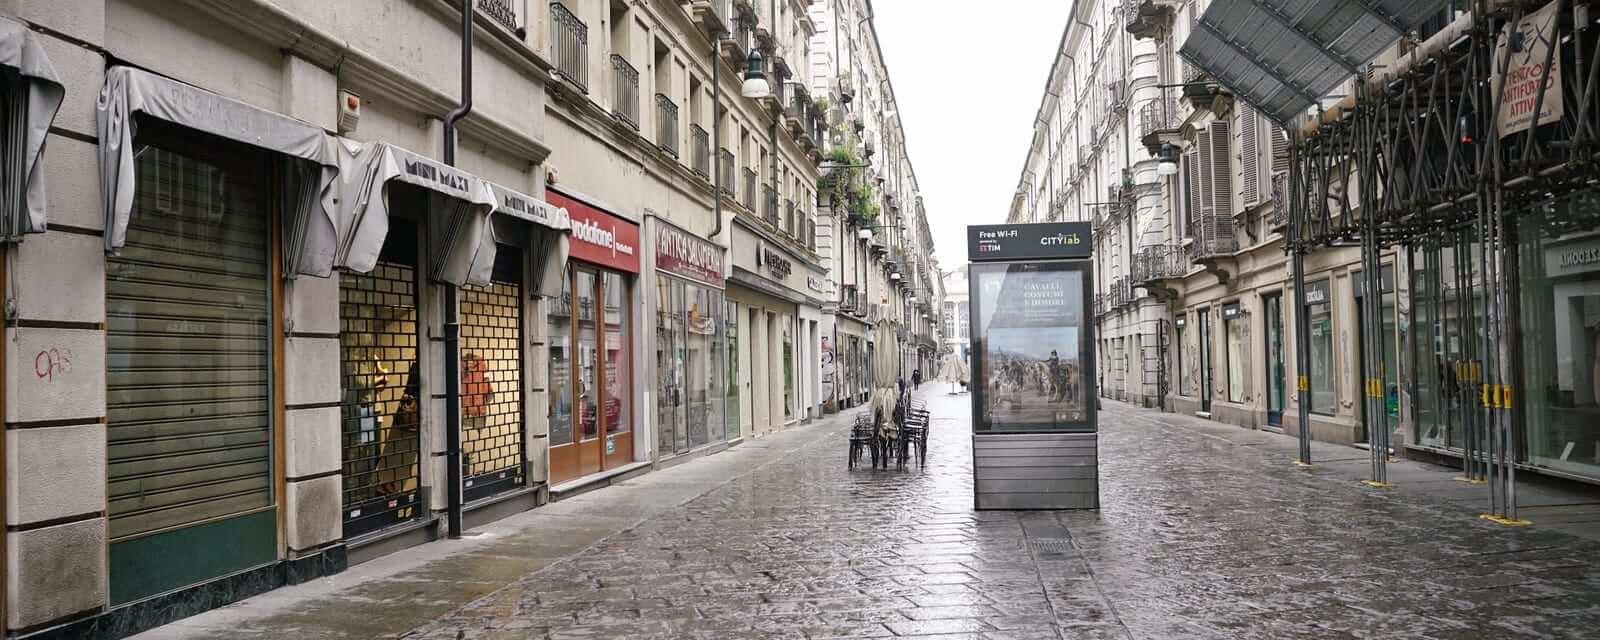 empty-street-covid-19